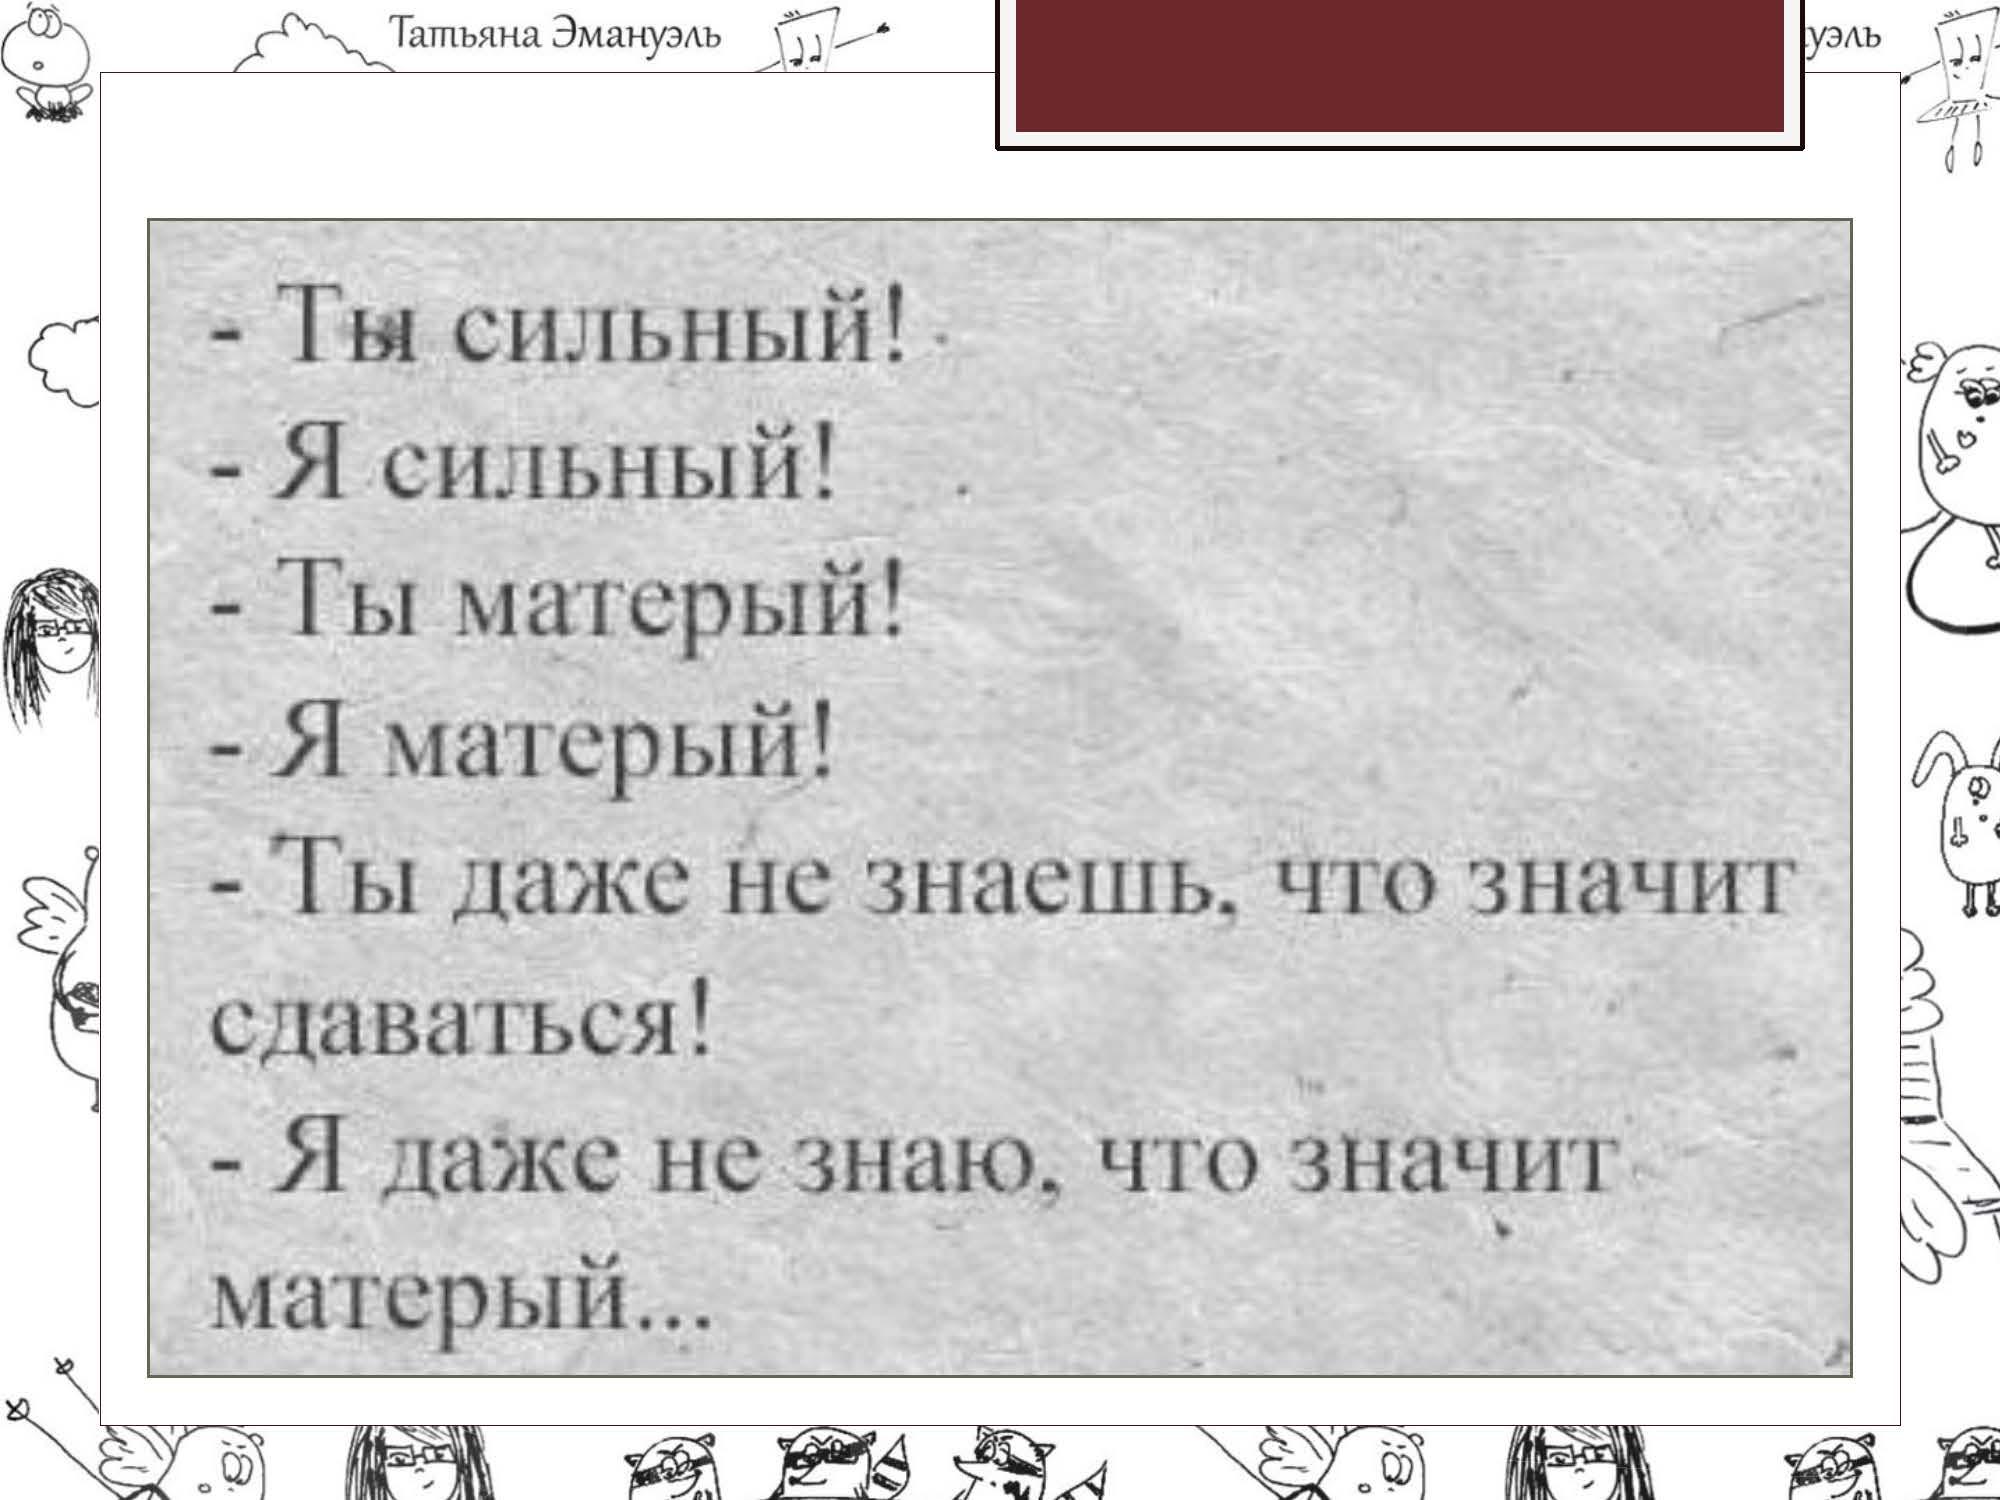 06 февраля эмануэль_Страница_054